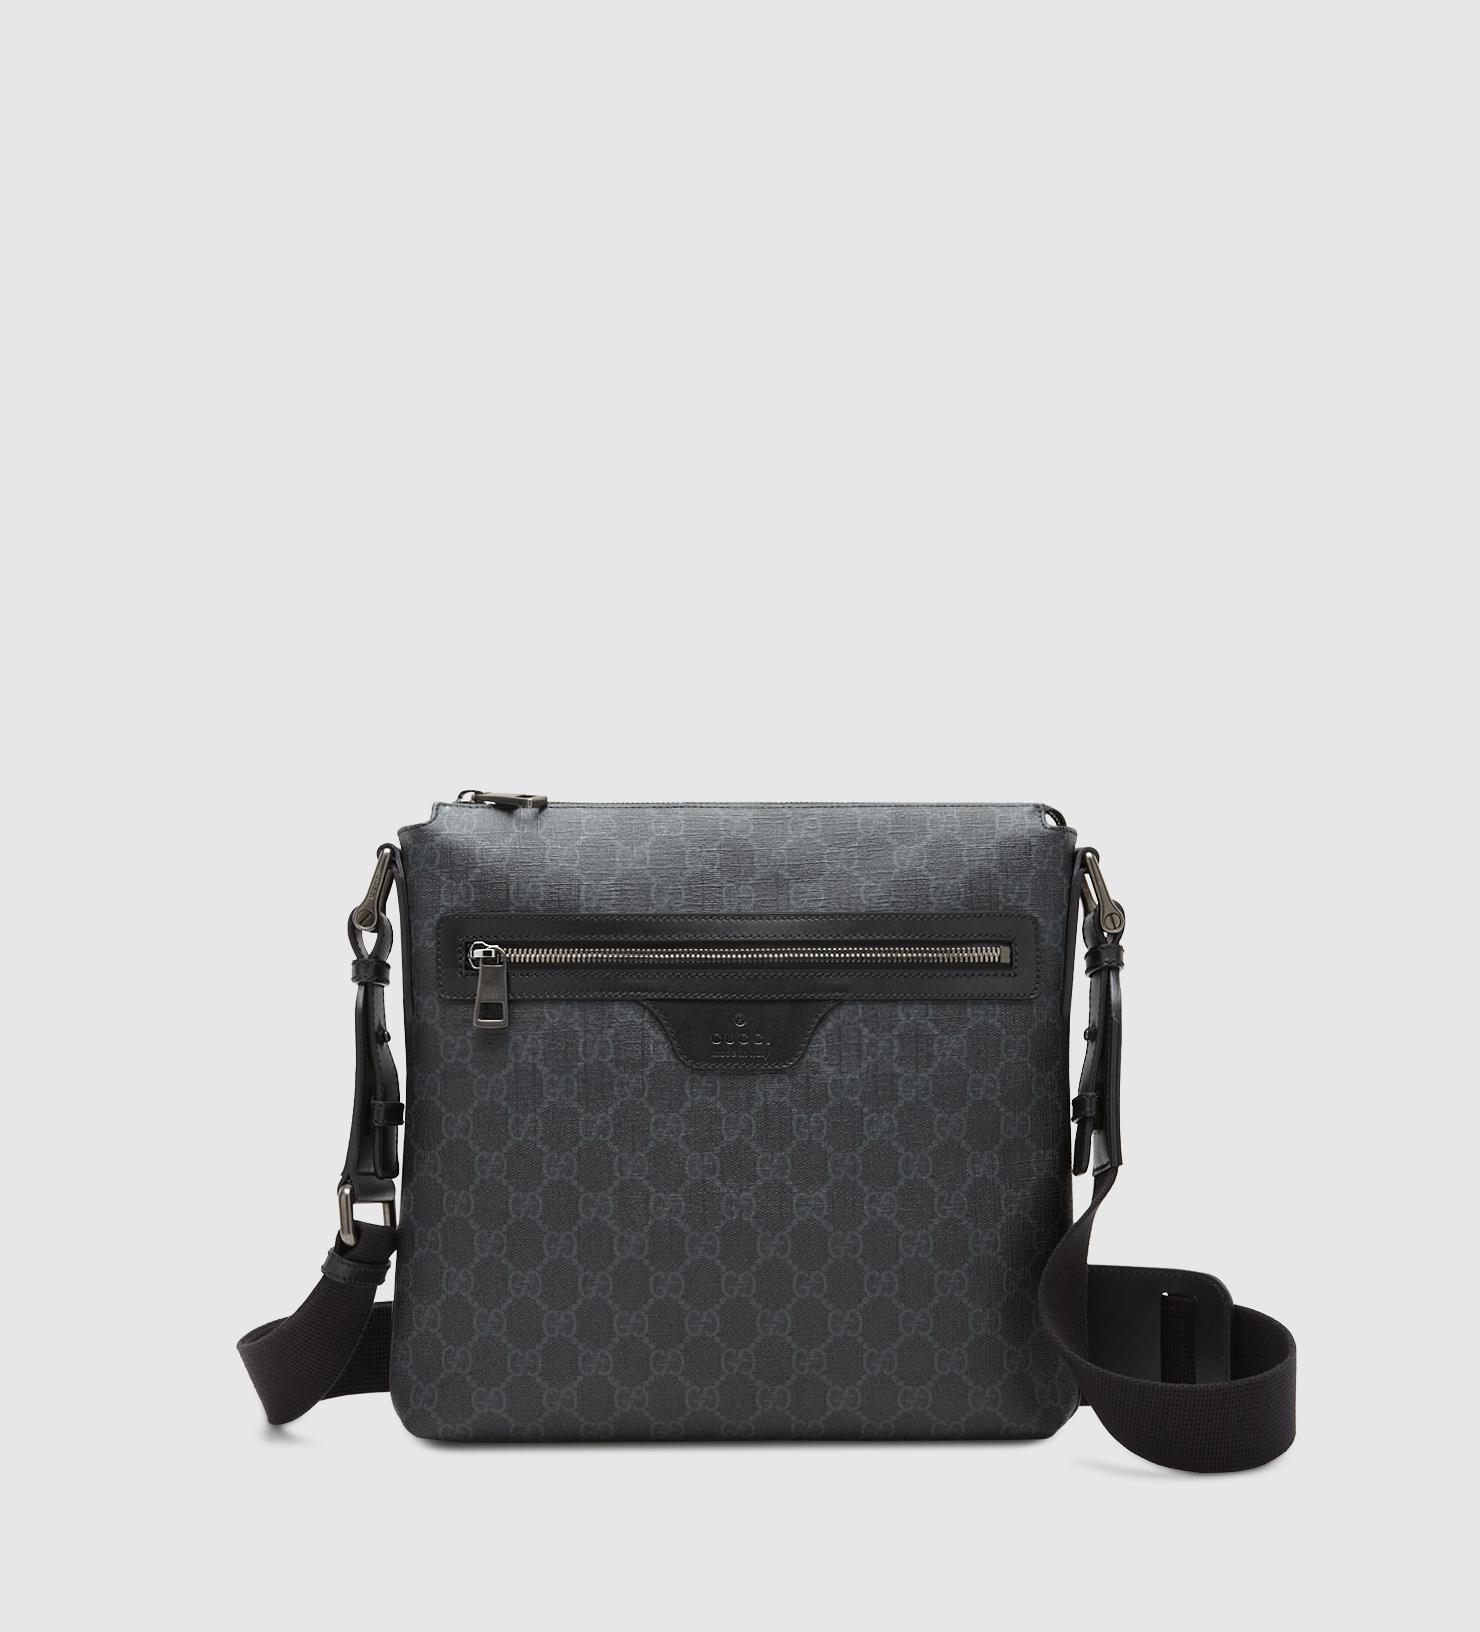 53e594bd4264 Gucci Gg Supreme Canvas Messenger Bag in Black for Men - Lyst